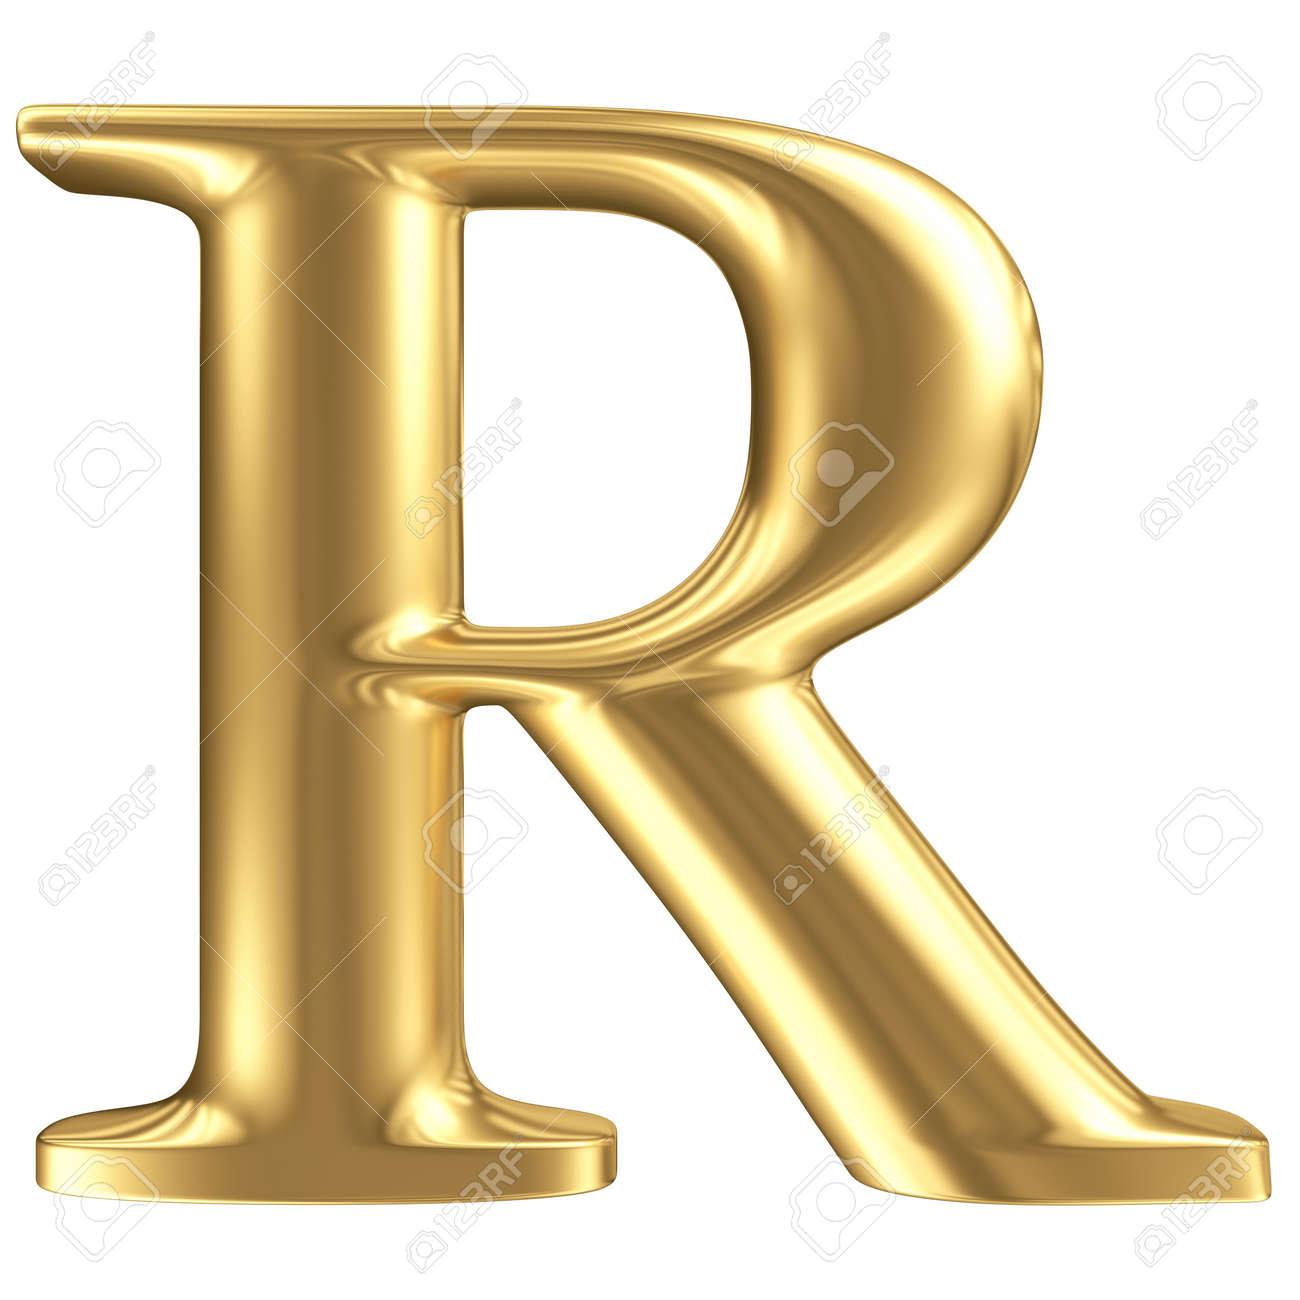 Golden Matt Letter R Jewellery Font Collection Stock Photo